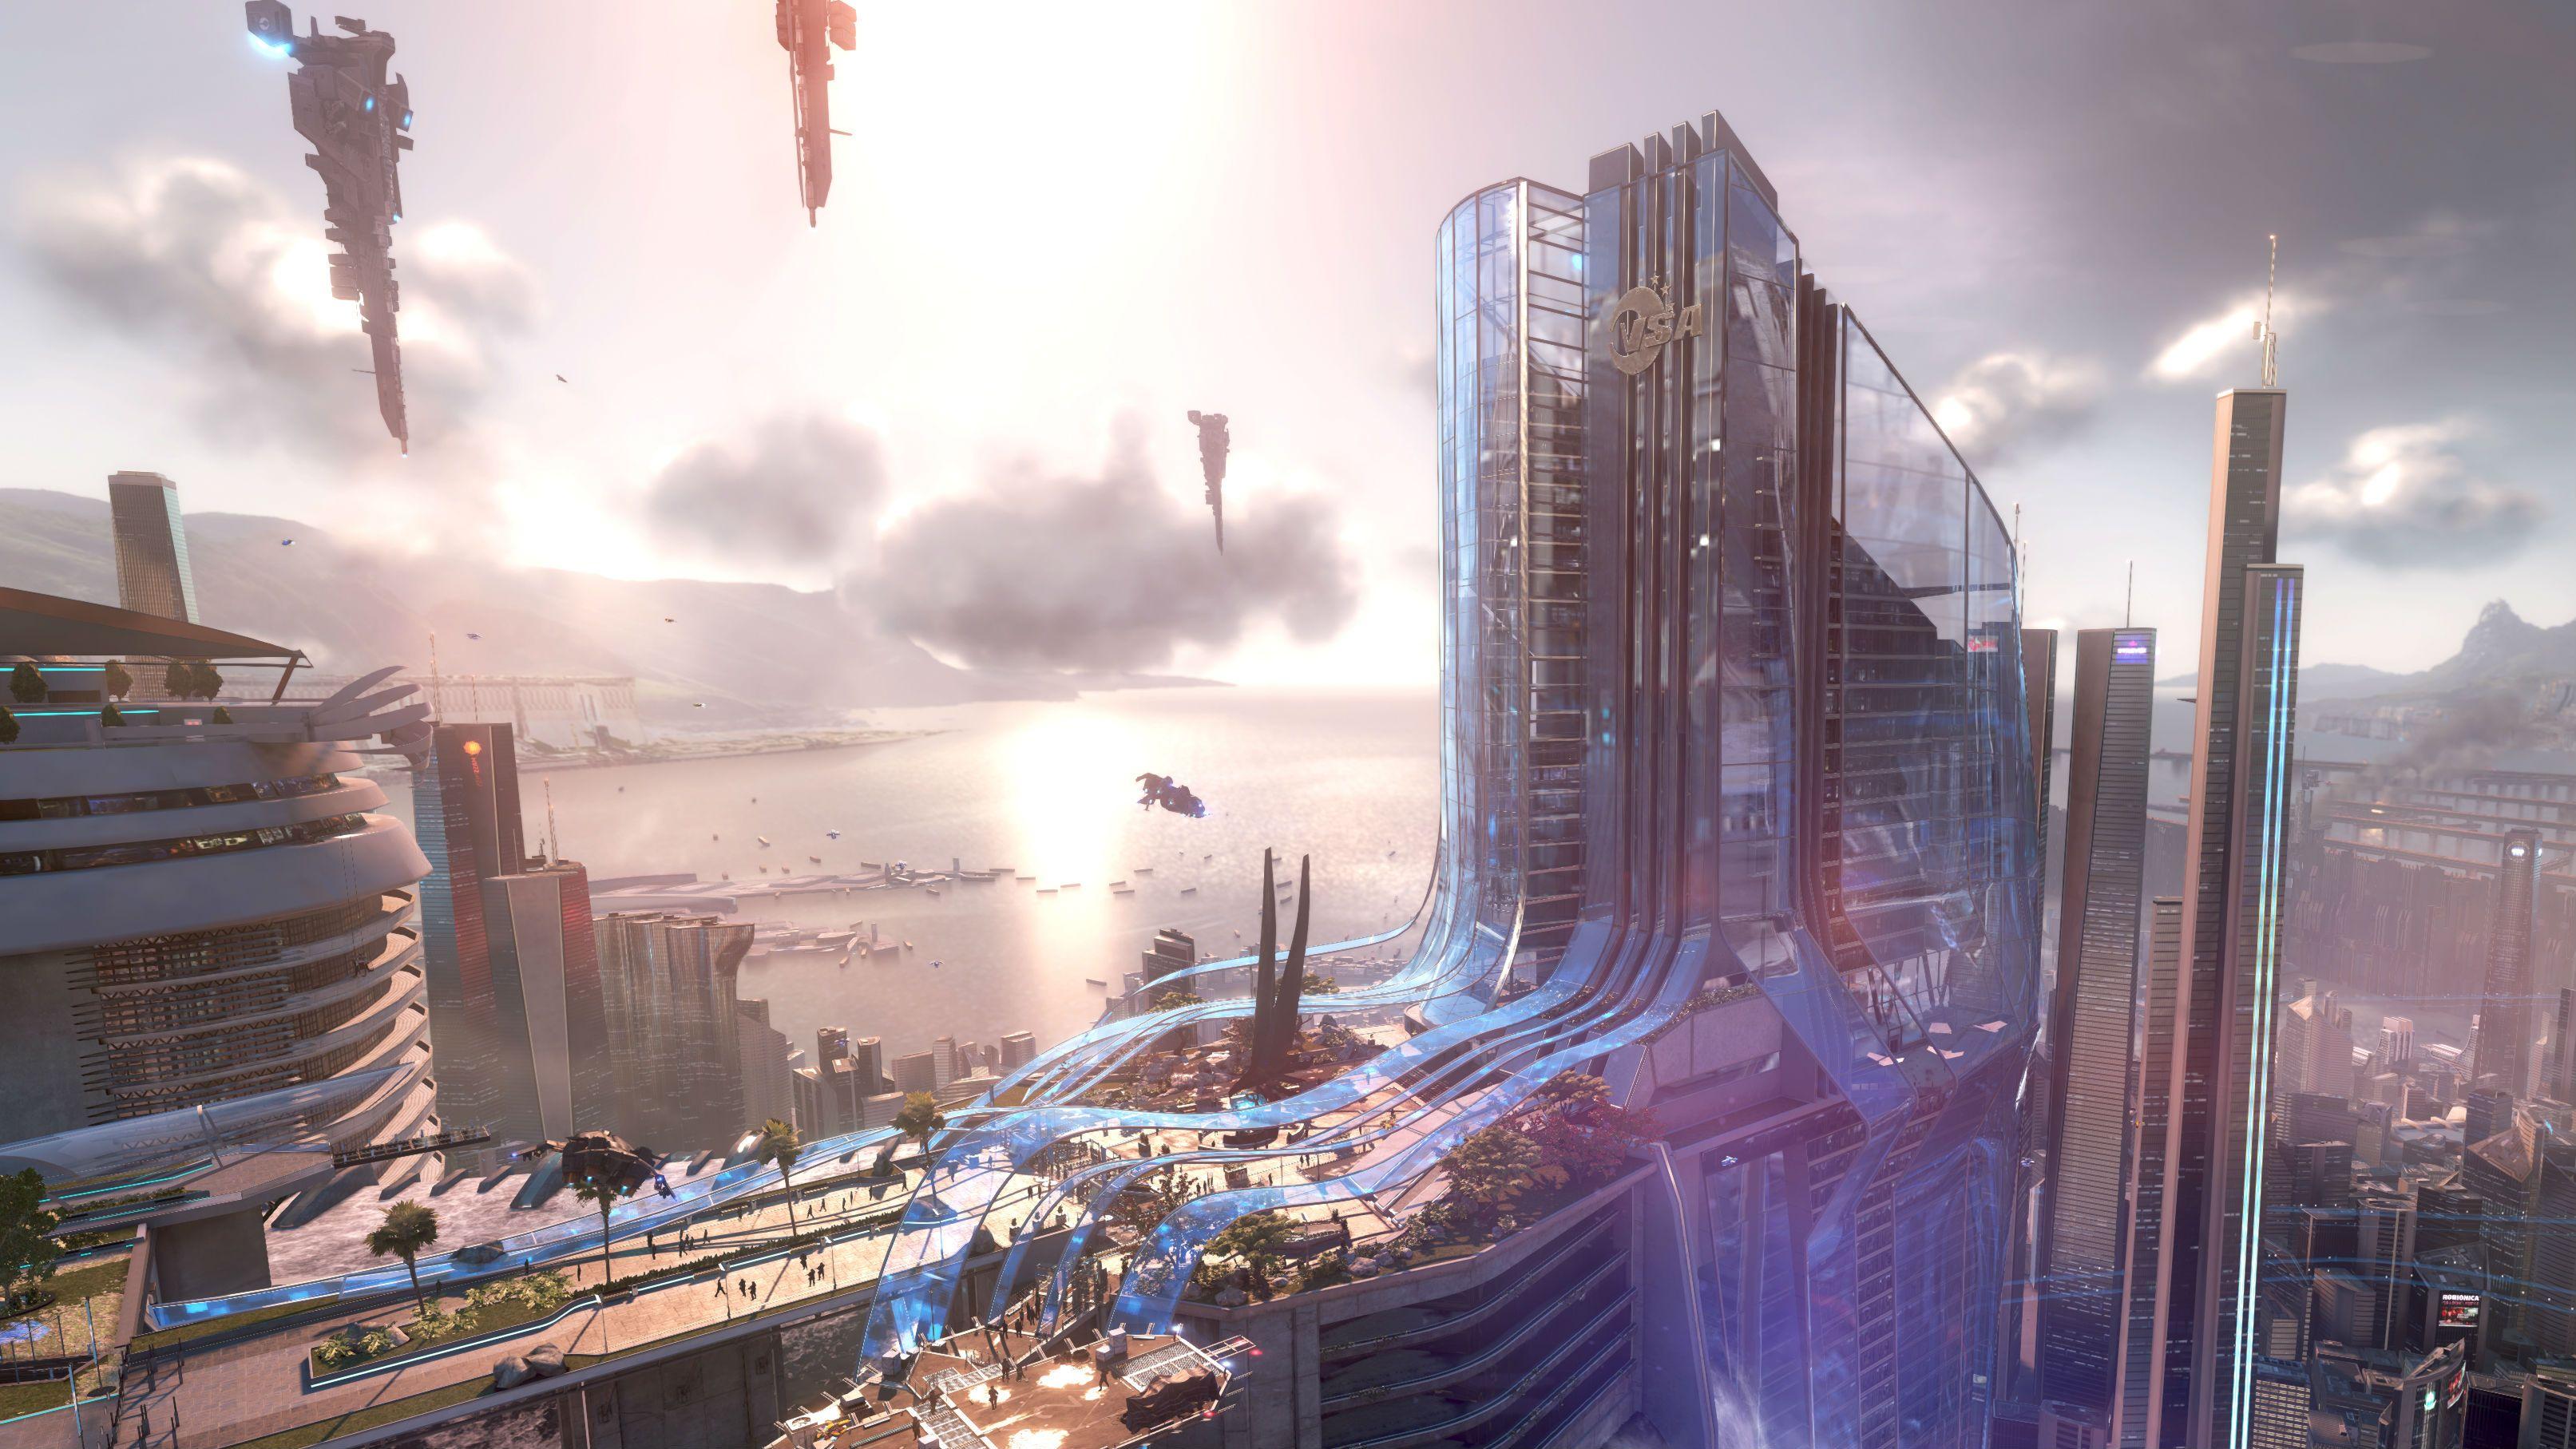 Ps4 Games Science Fiction : Sci fi city picture wallpaper pinterest